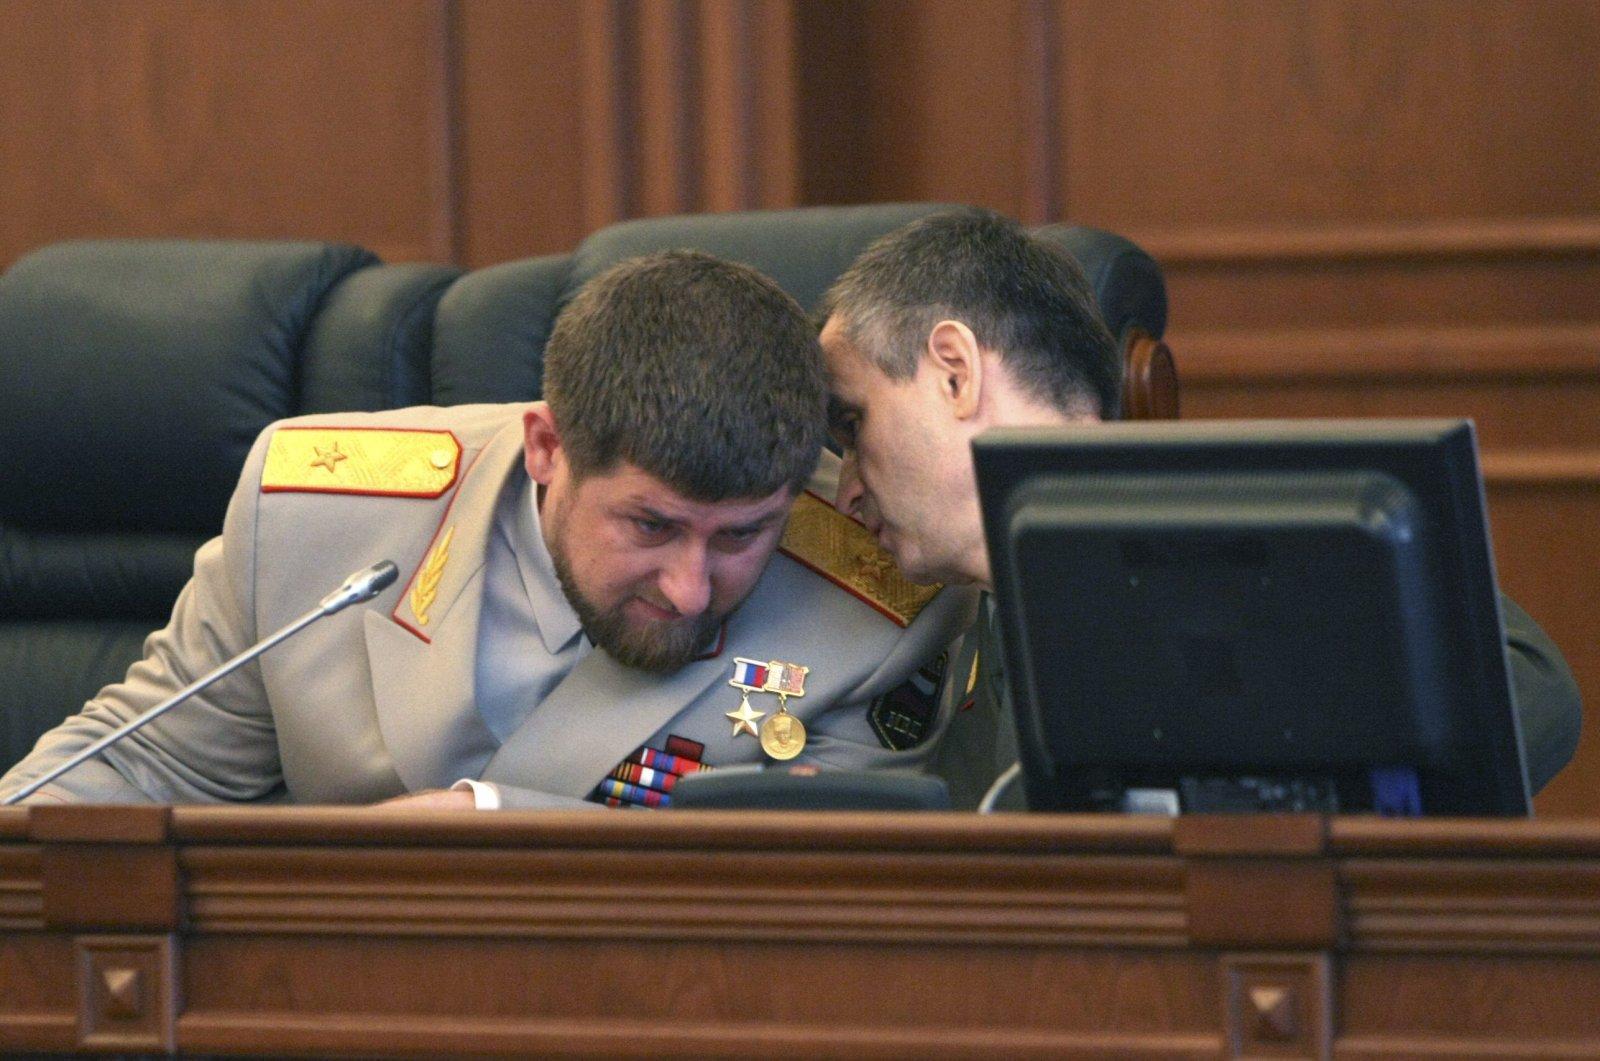 Chechen leader Ramzan Kadyrov (L) listens to then-Russian Interior Minister Rashid Nurgaliyev in the parliament in Grozny, Chechnya, Russia, Oct. 19, 2010. (Reuters Photo)